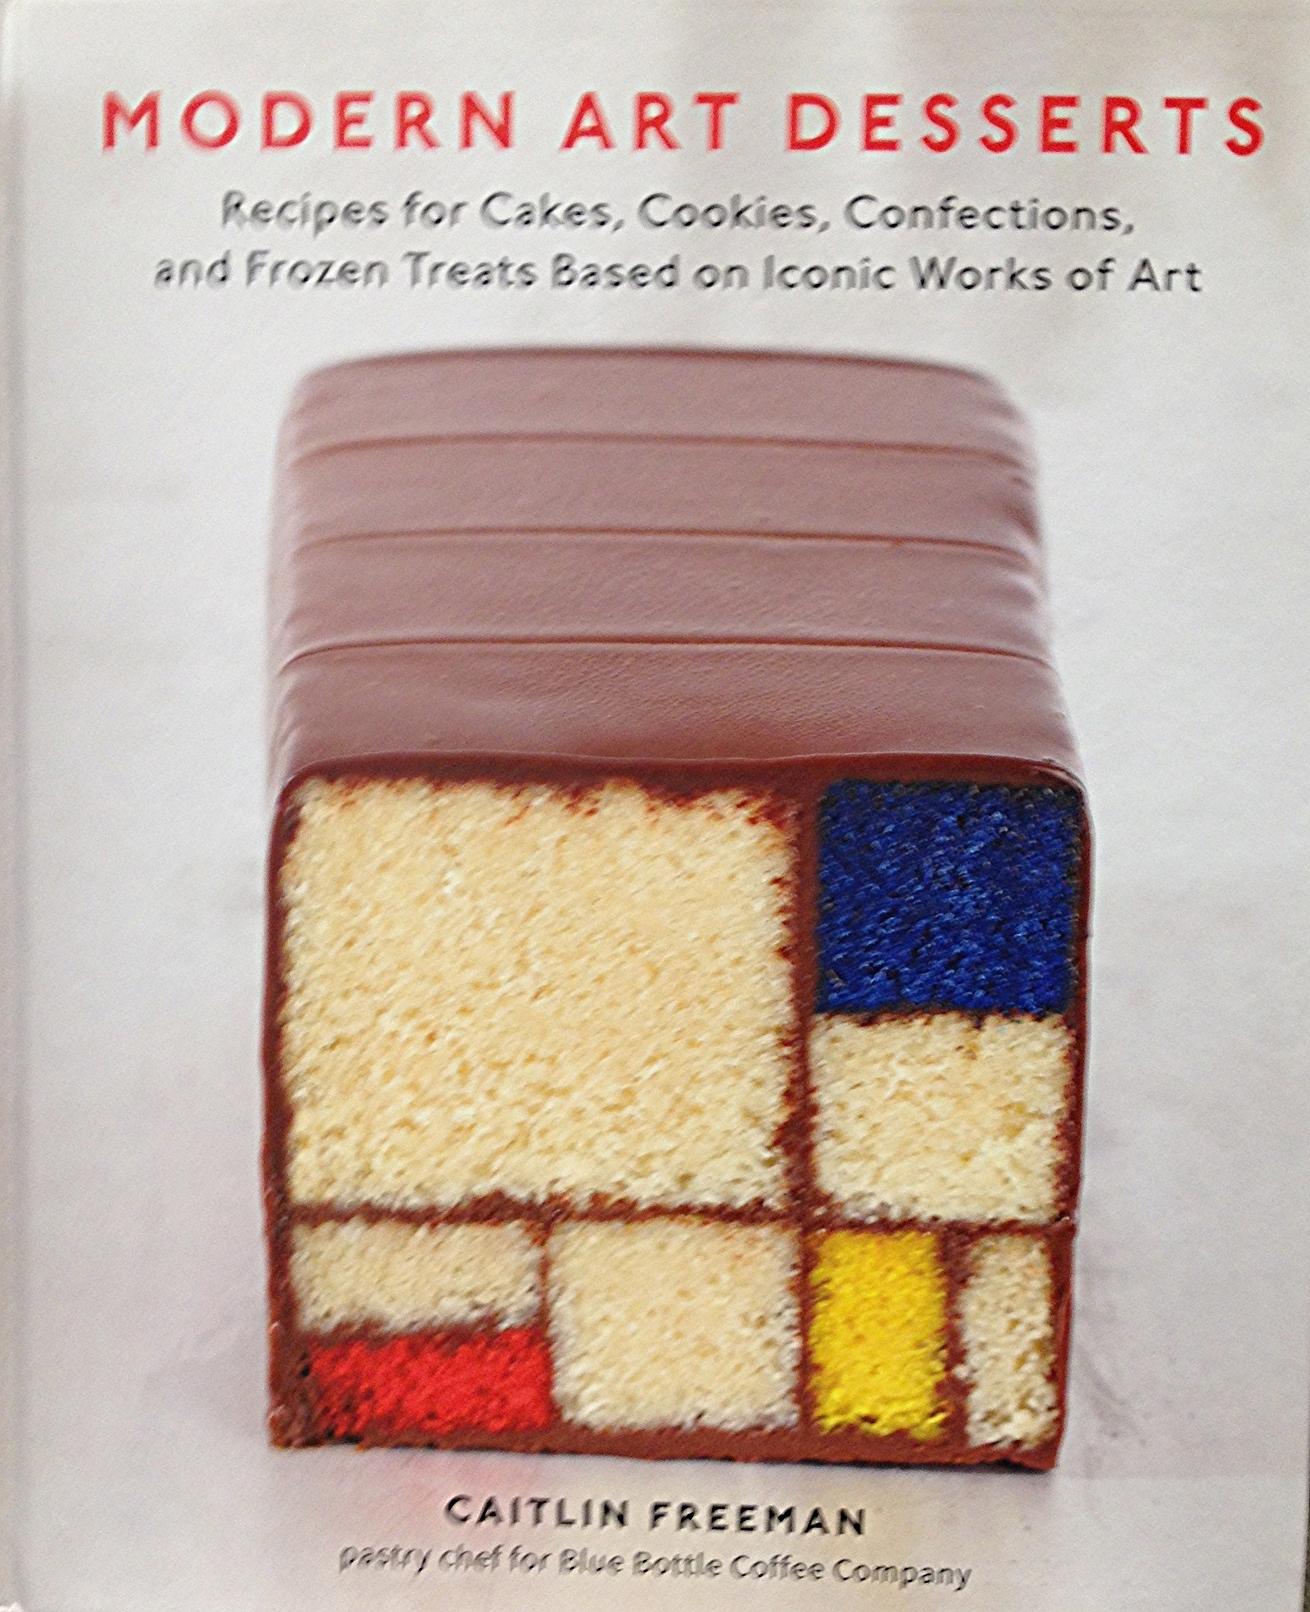 Modern Art Desserts by Caitlin Freeman - MoMA